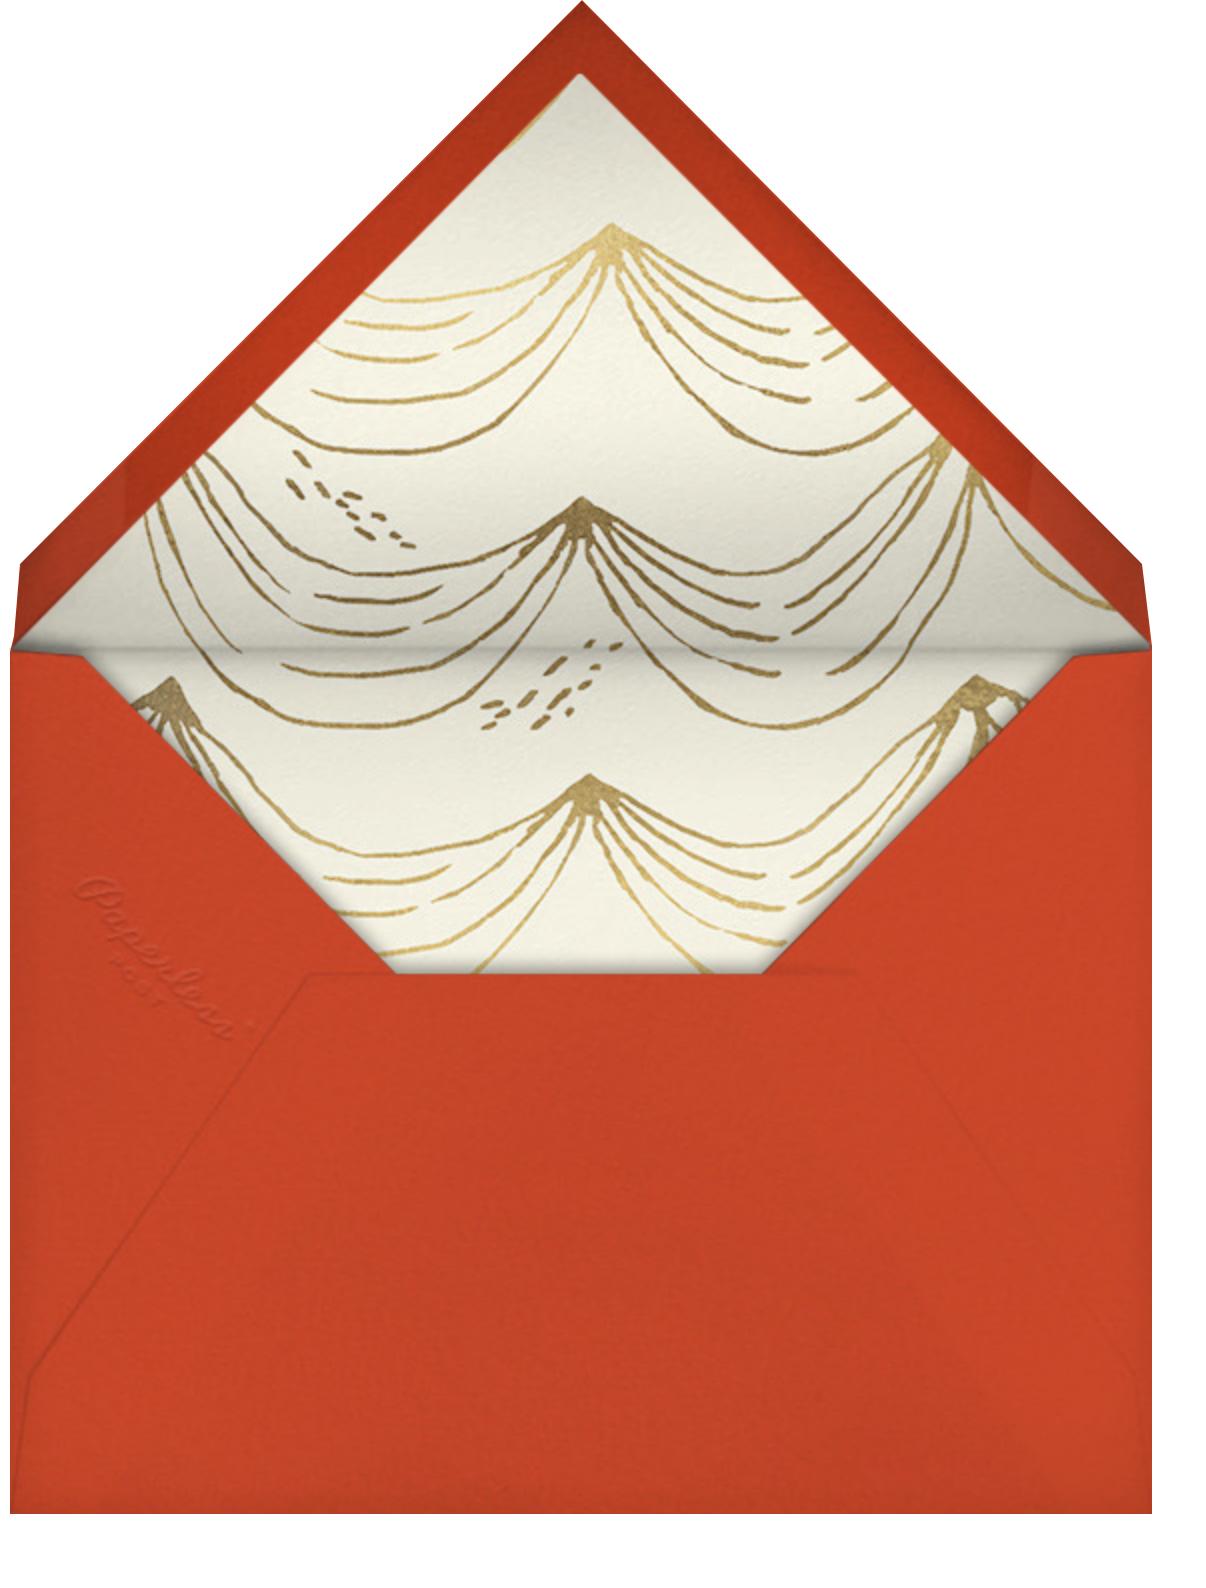 Life is Sweet - Paperless Post - General entertaining - envelope back